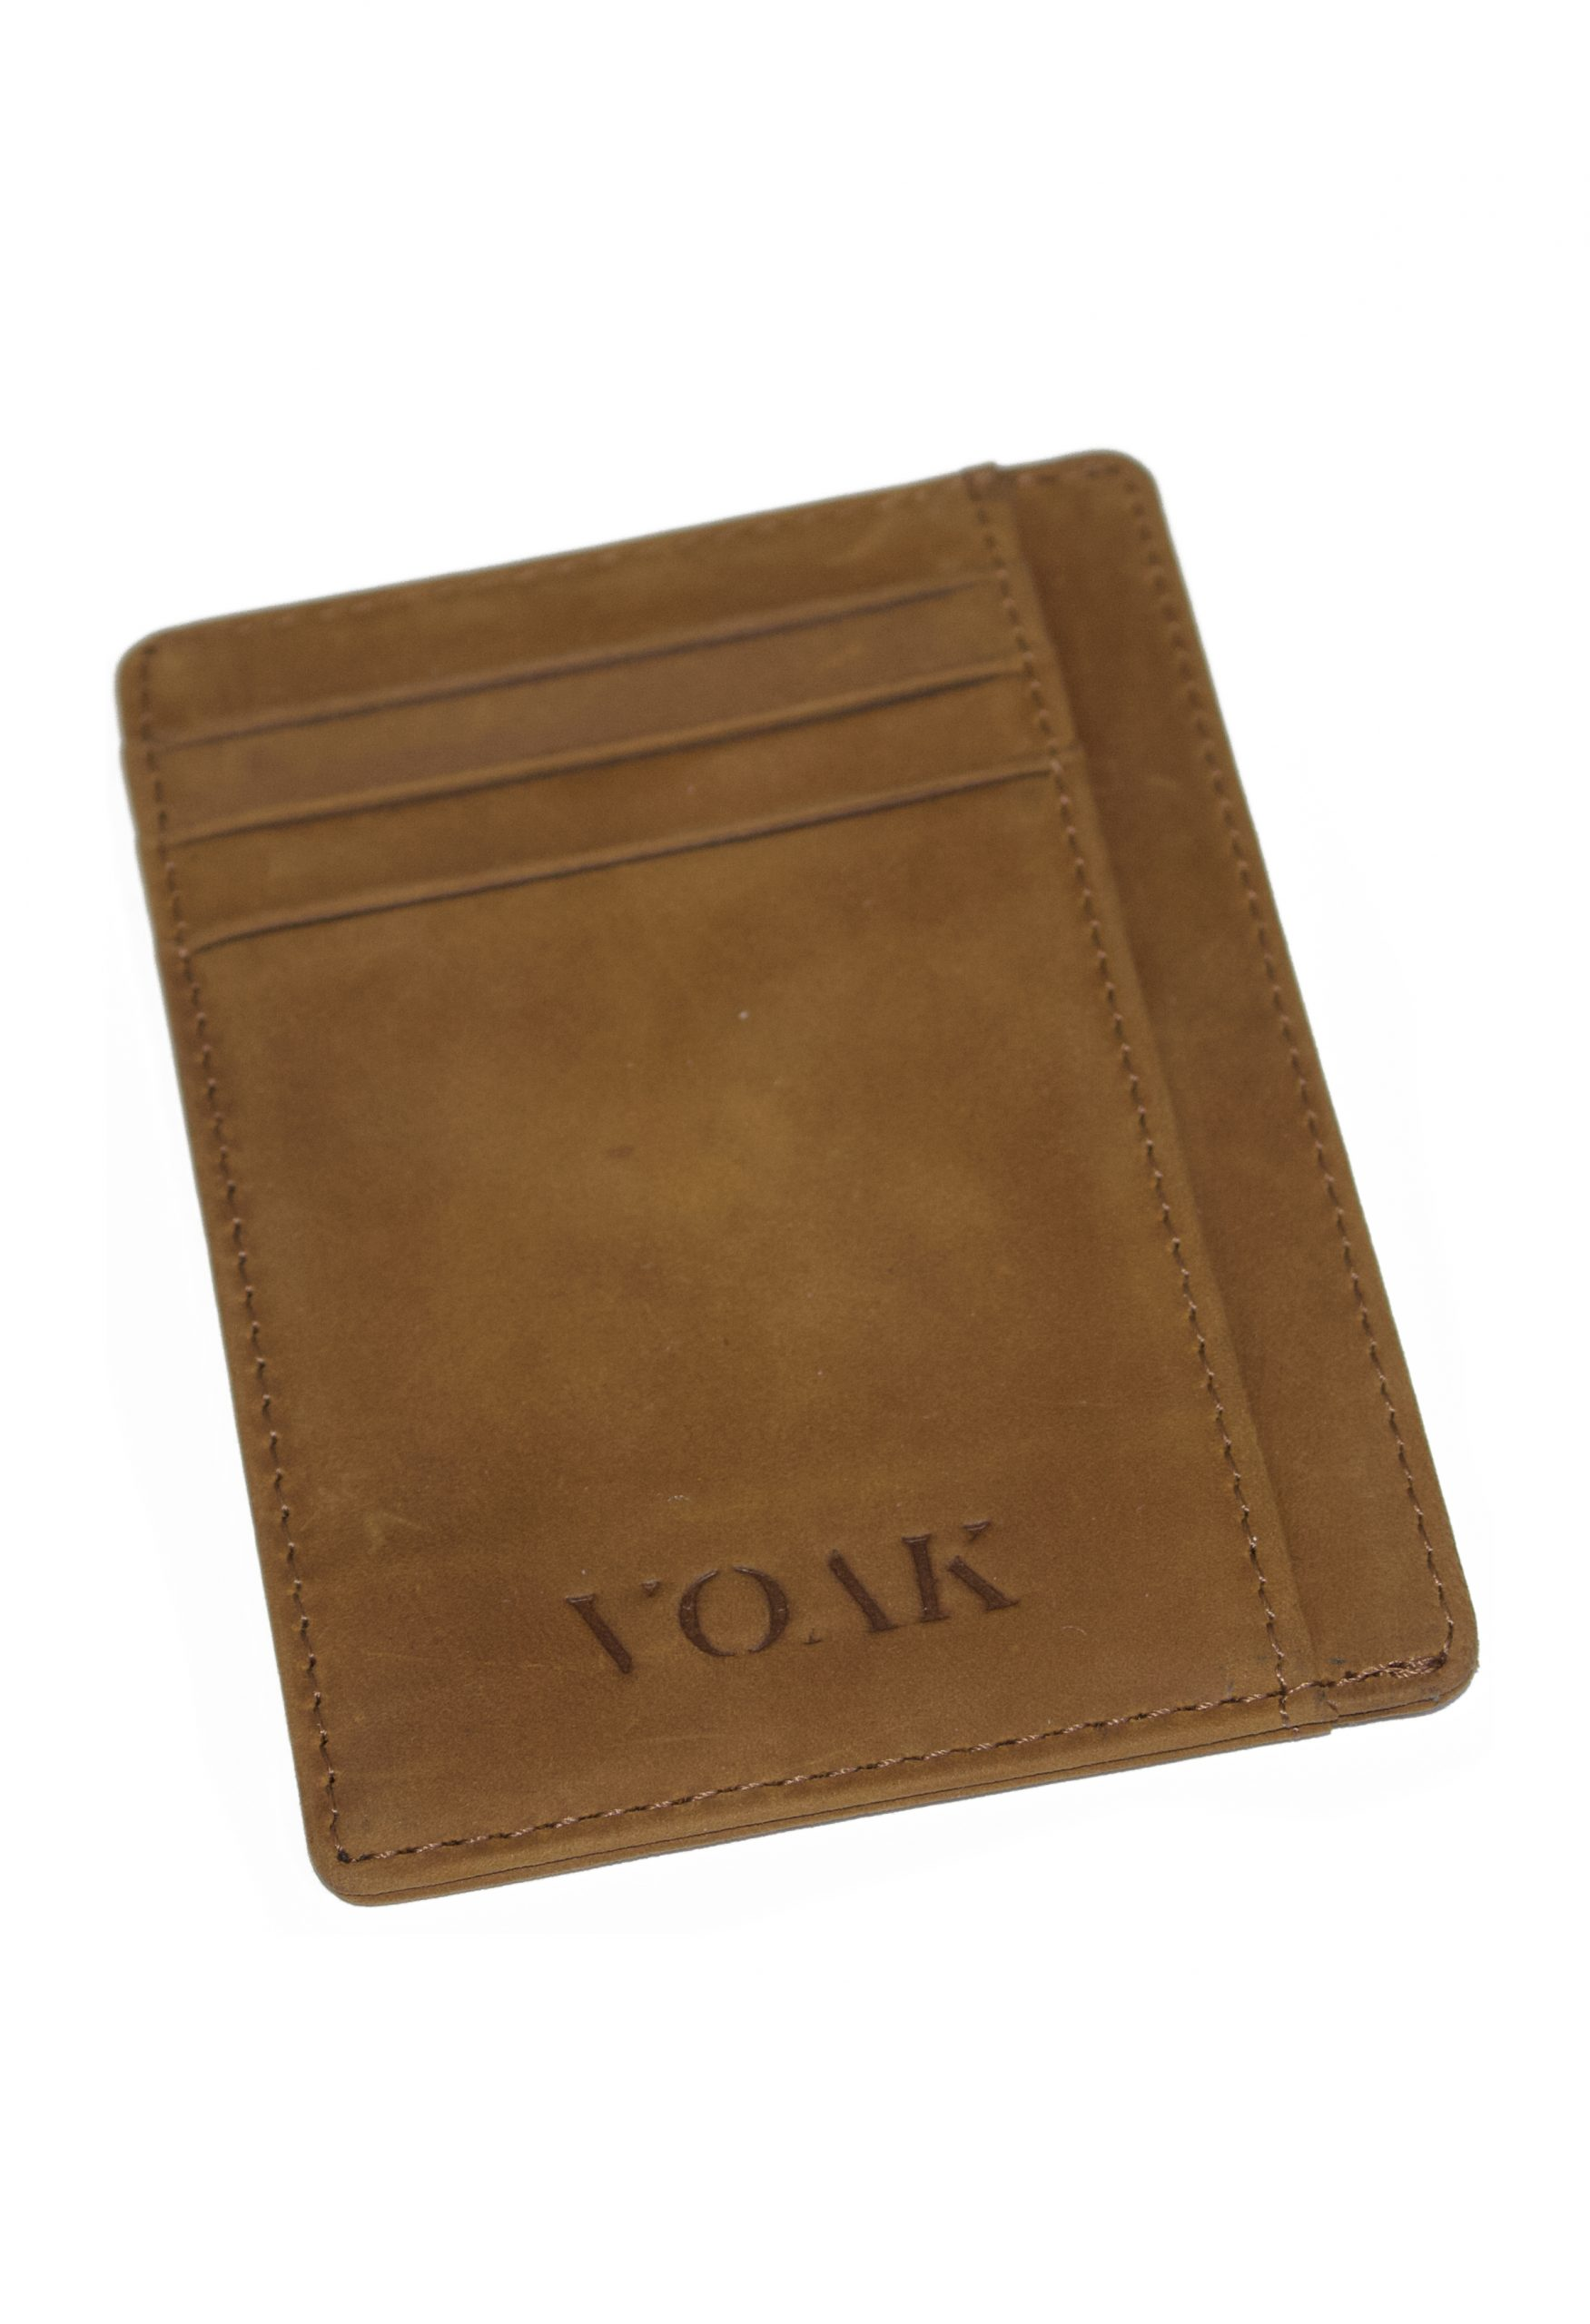 Voak Genuine Leather Cardholder